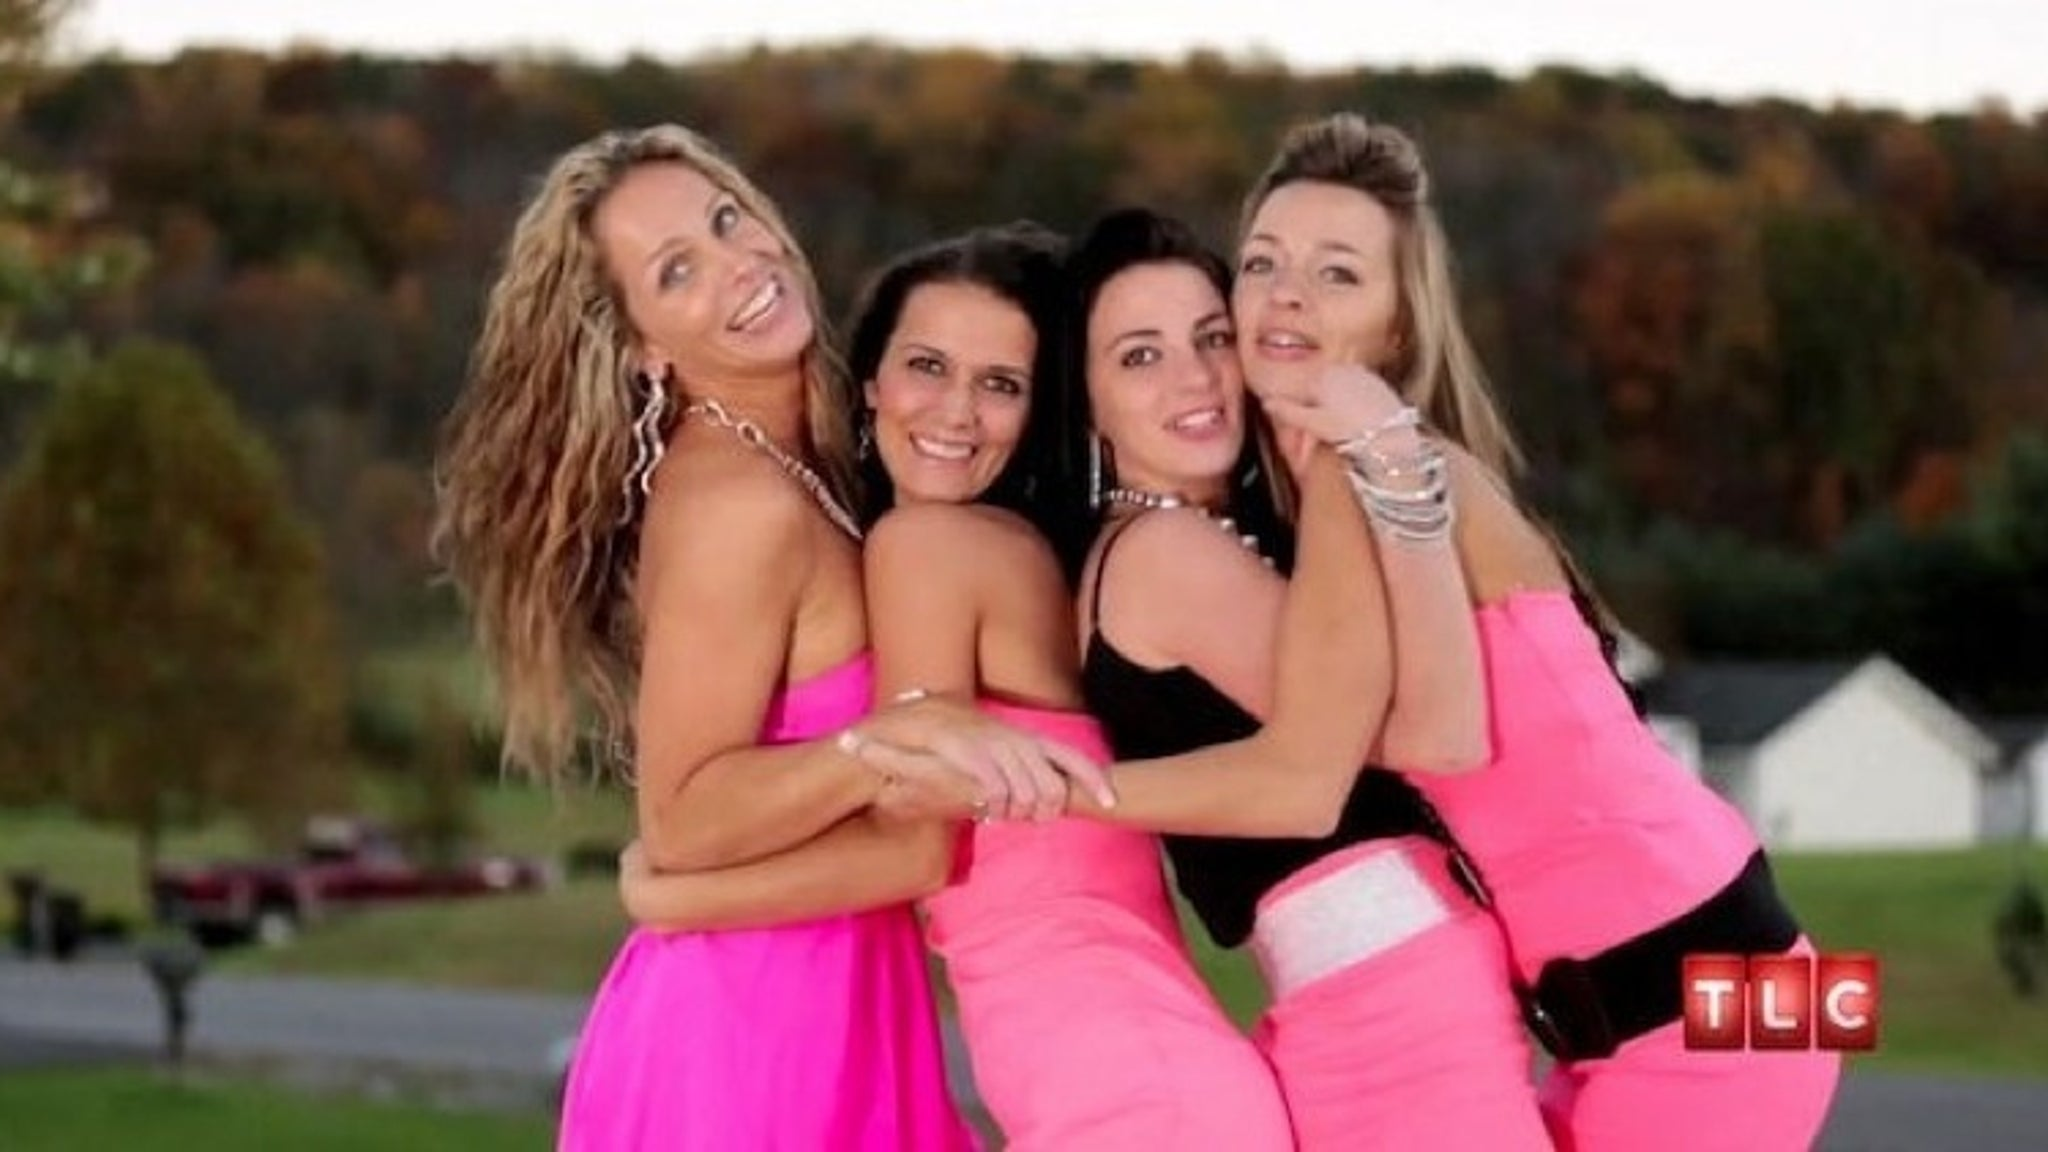 Meet the Gypsy Sisters - Gypsy Sisters | TLC